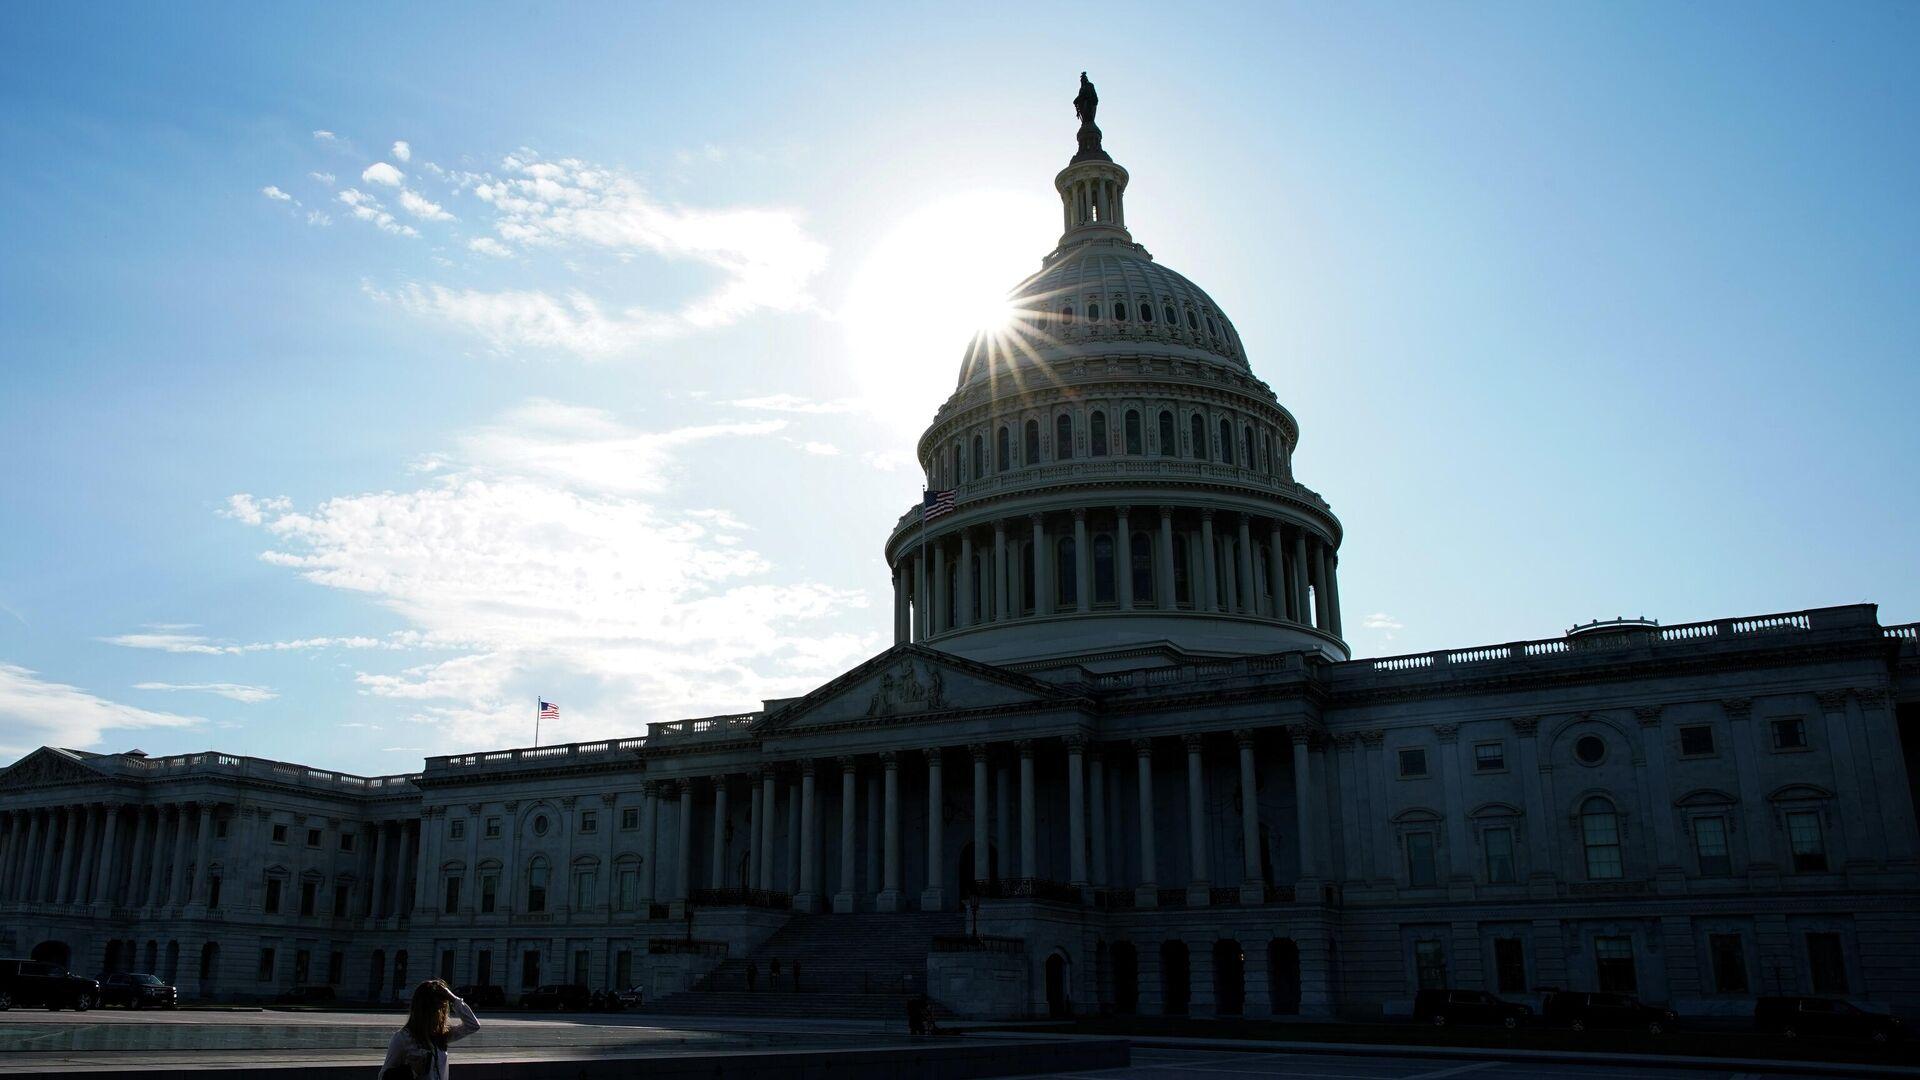 The U.S. Capitol is seen in Washington, U.S., September 27, 2021. - Sputnik International, 1920, 27.09.2021